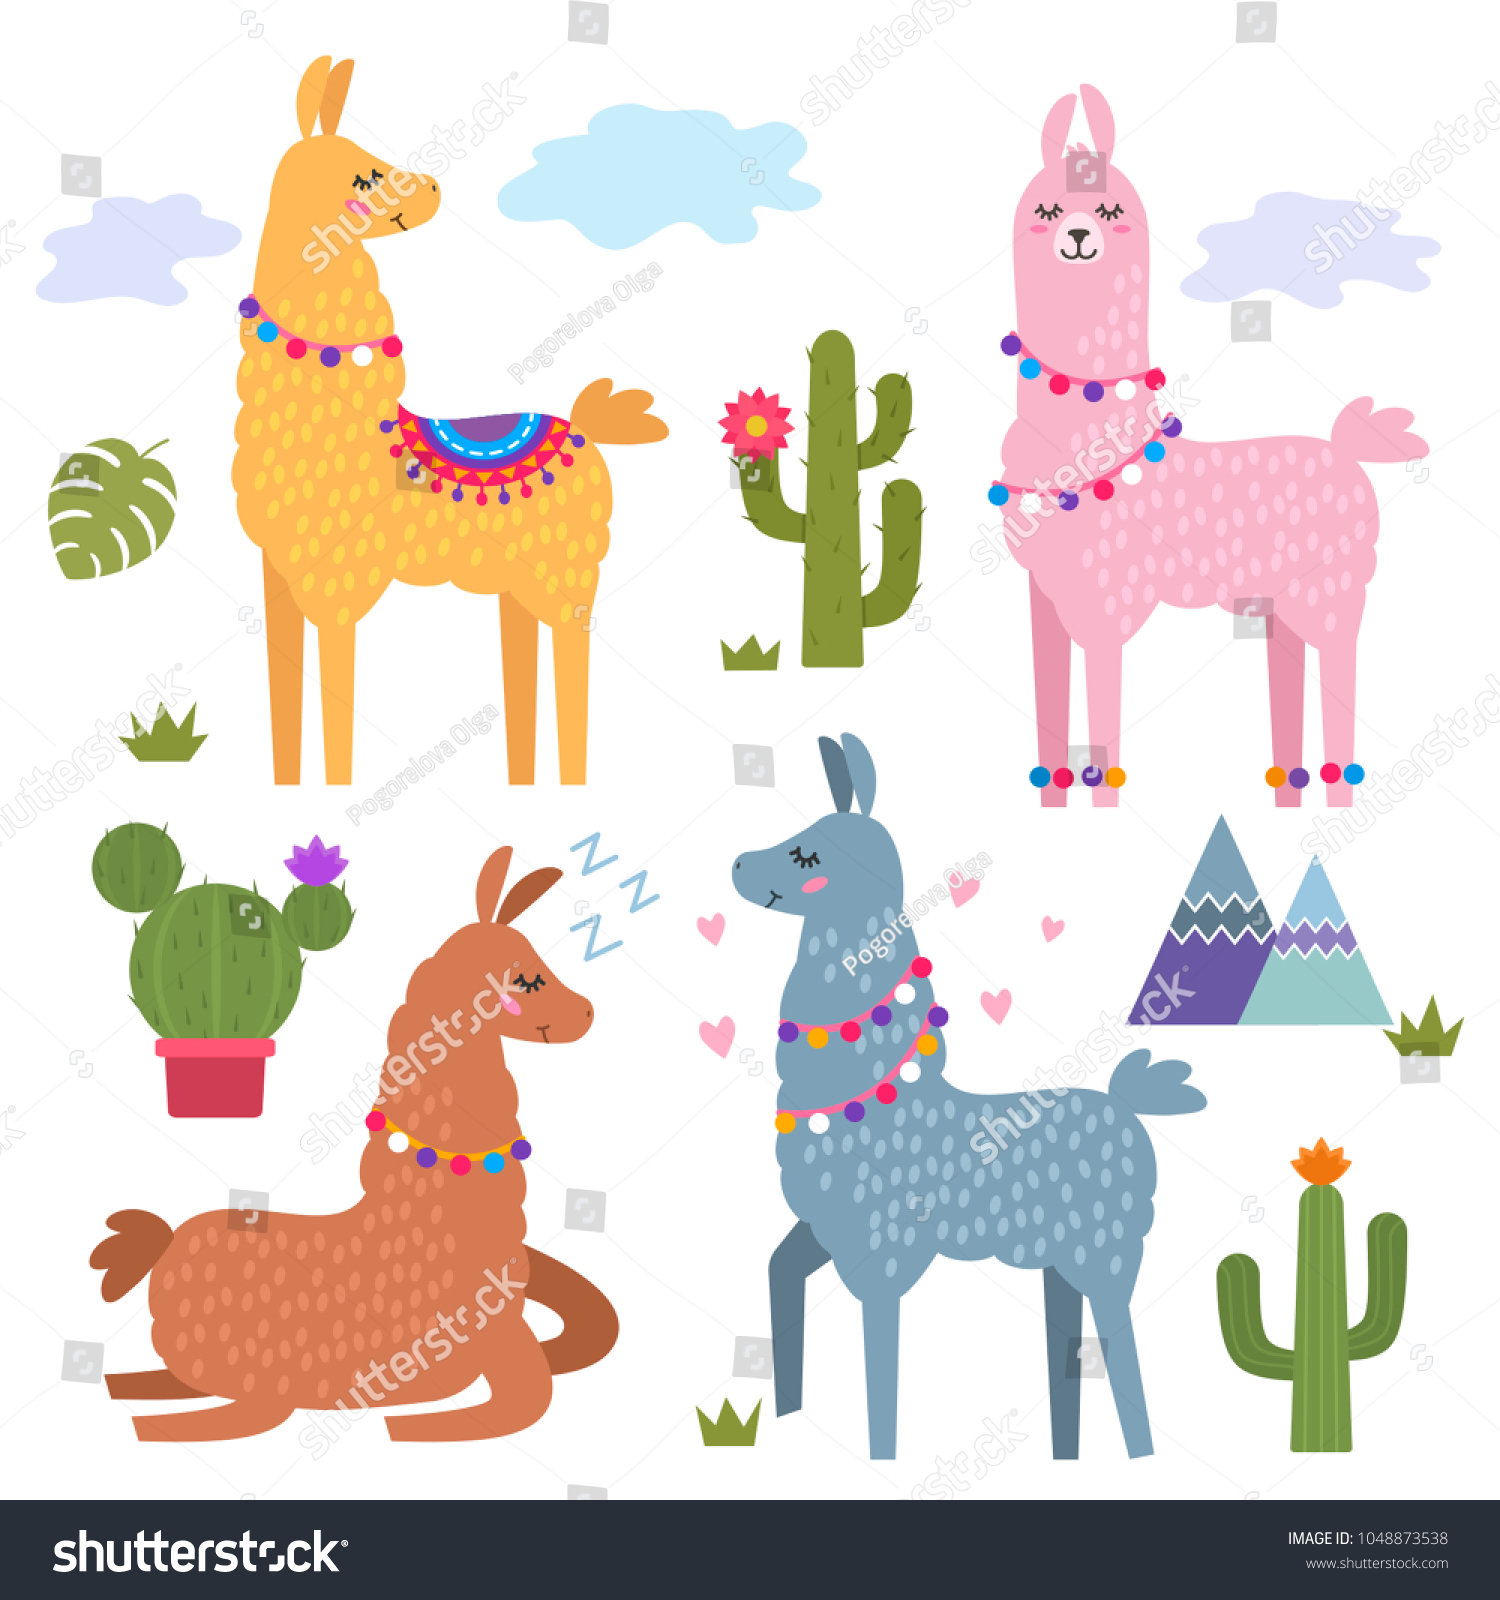 Funny Llama Alpaca Mountains Cactus Childrens Vector de stock (libre ...